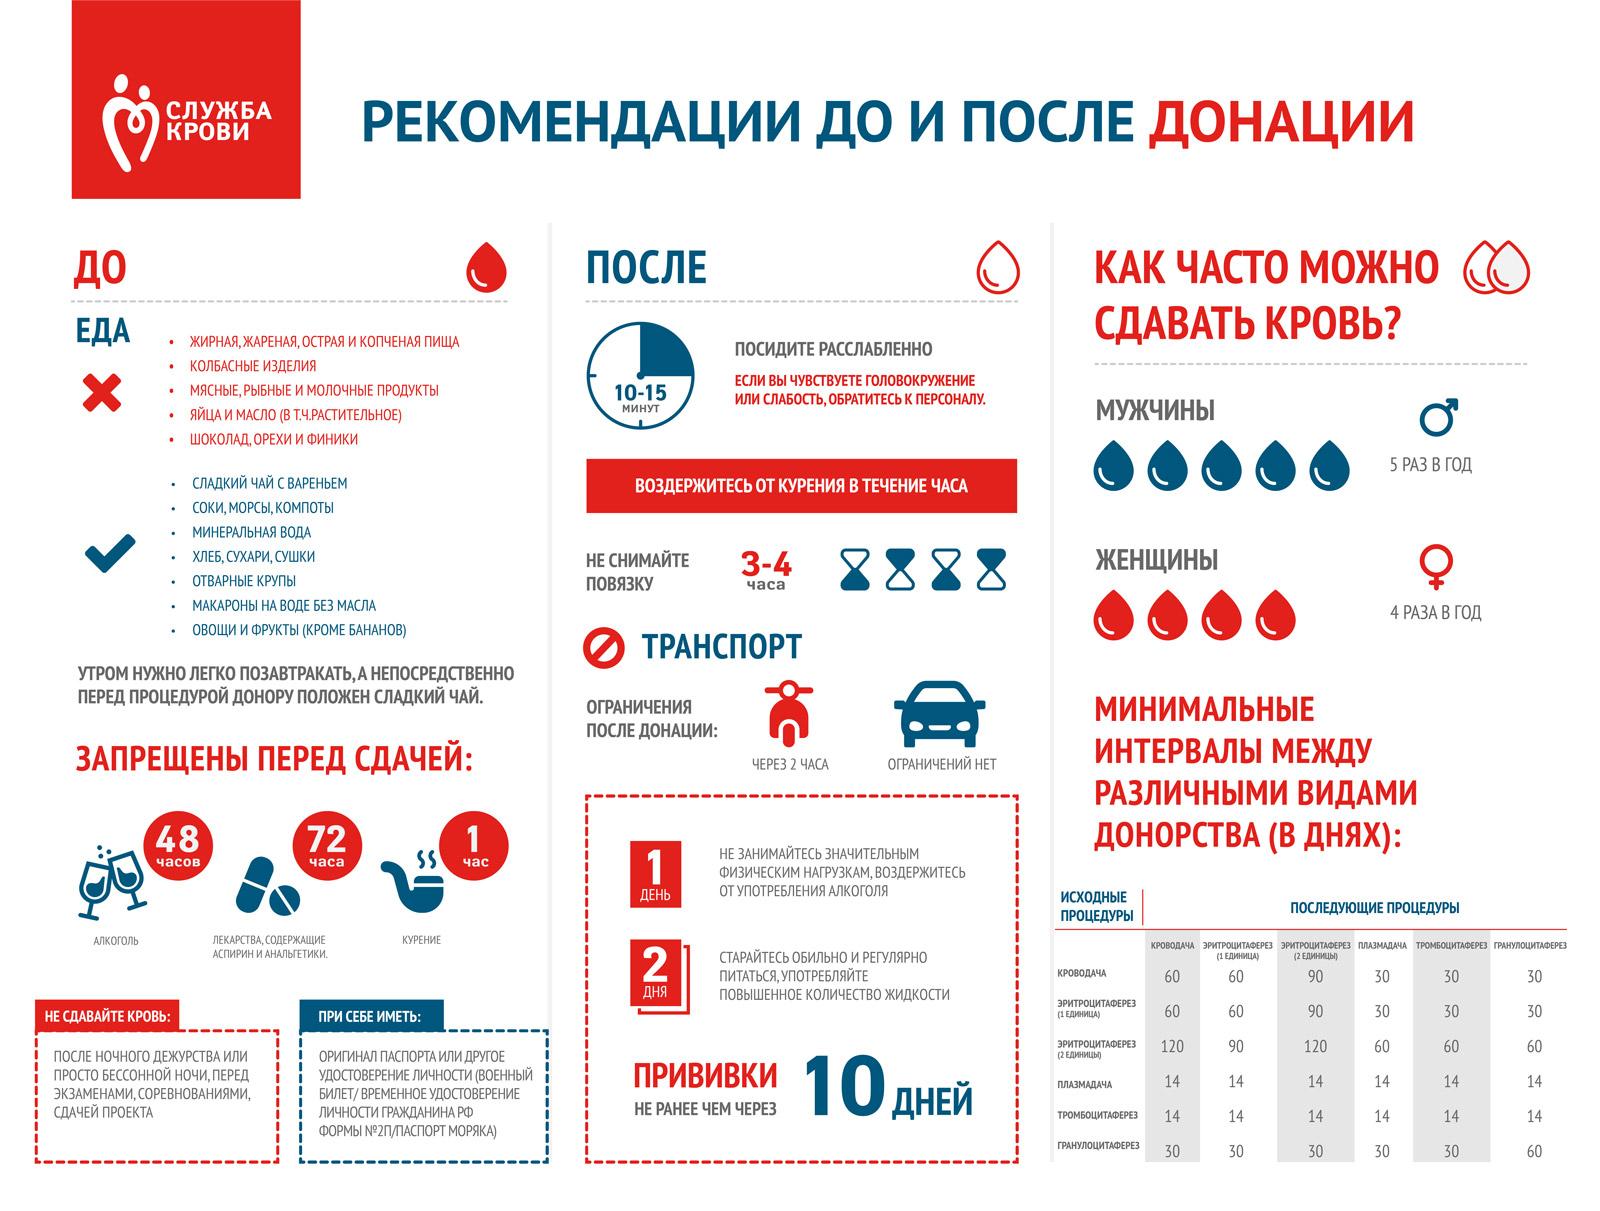 Подготовка к сдаче крови